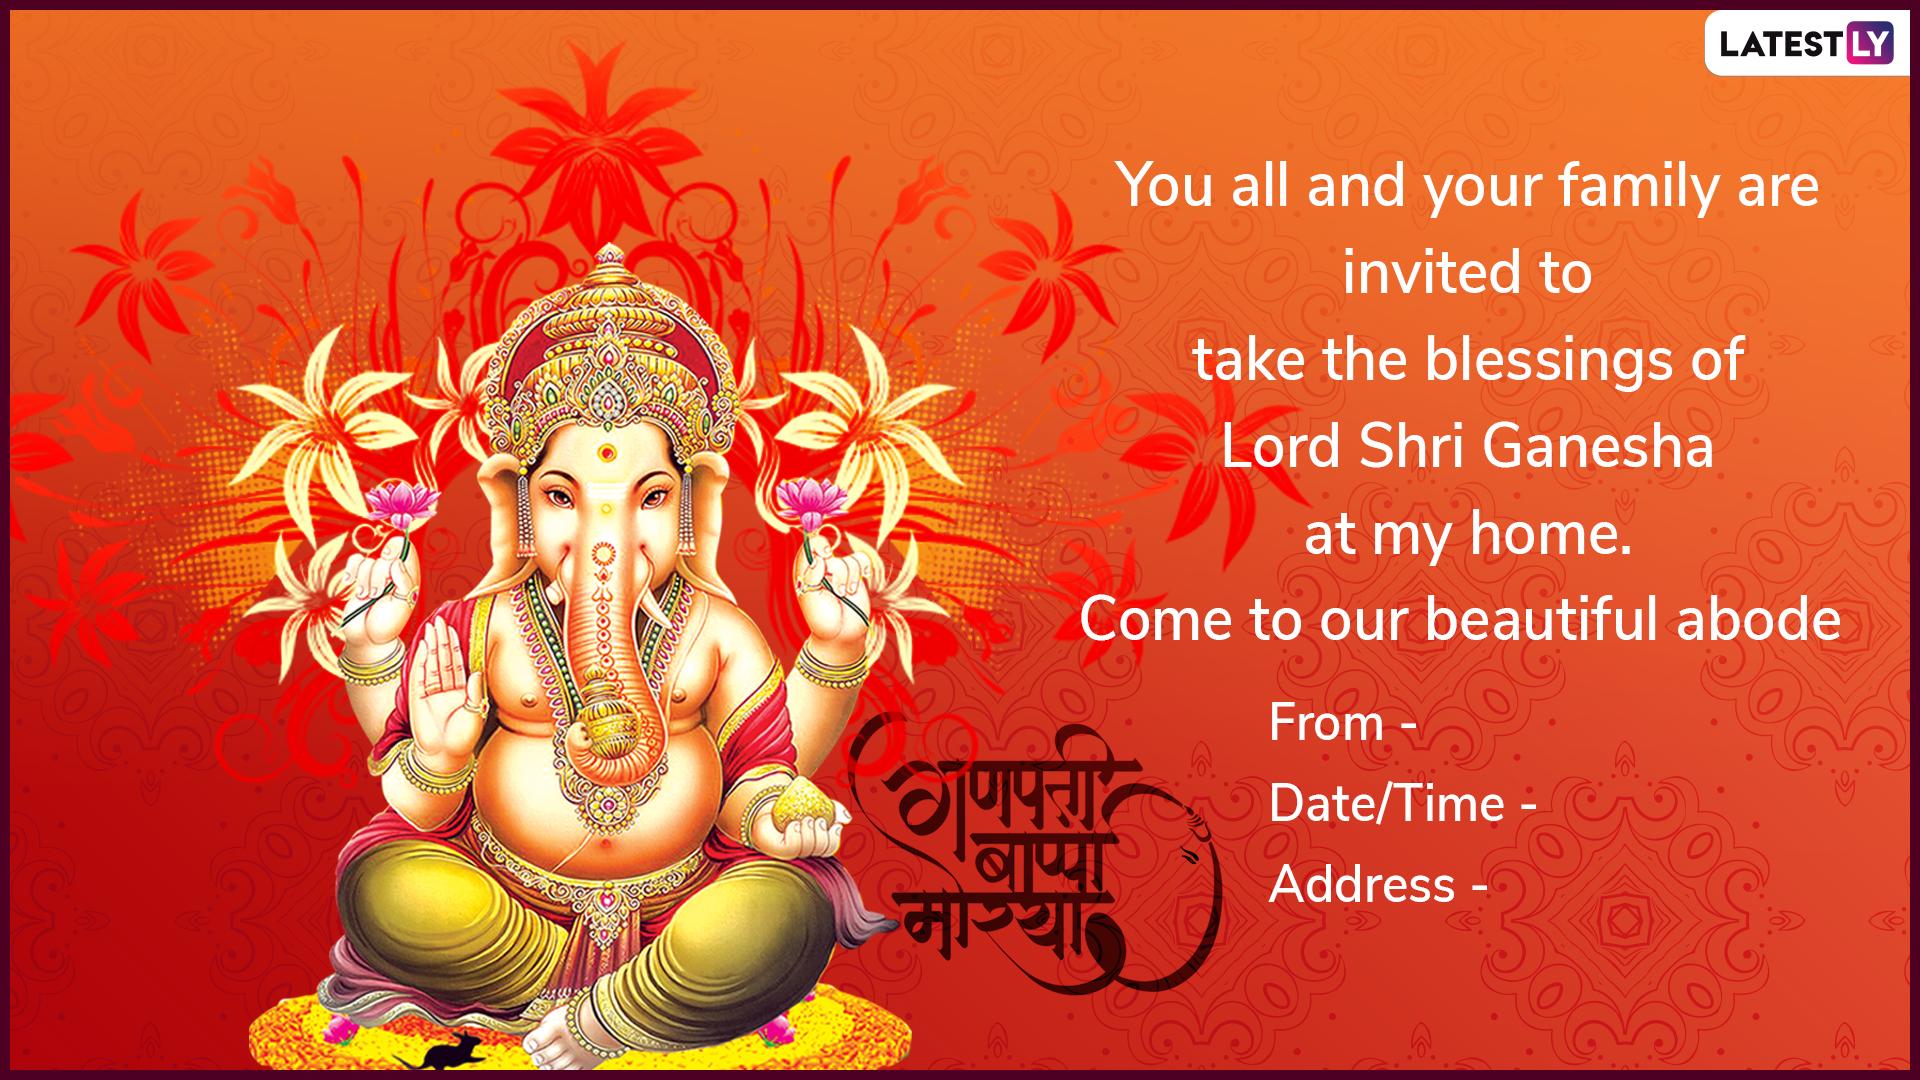 Ganesh Chaturthi 5 Invitation Cards Format: WhatsApp Messages